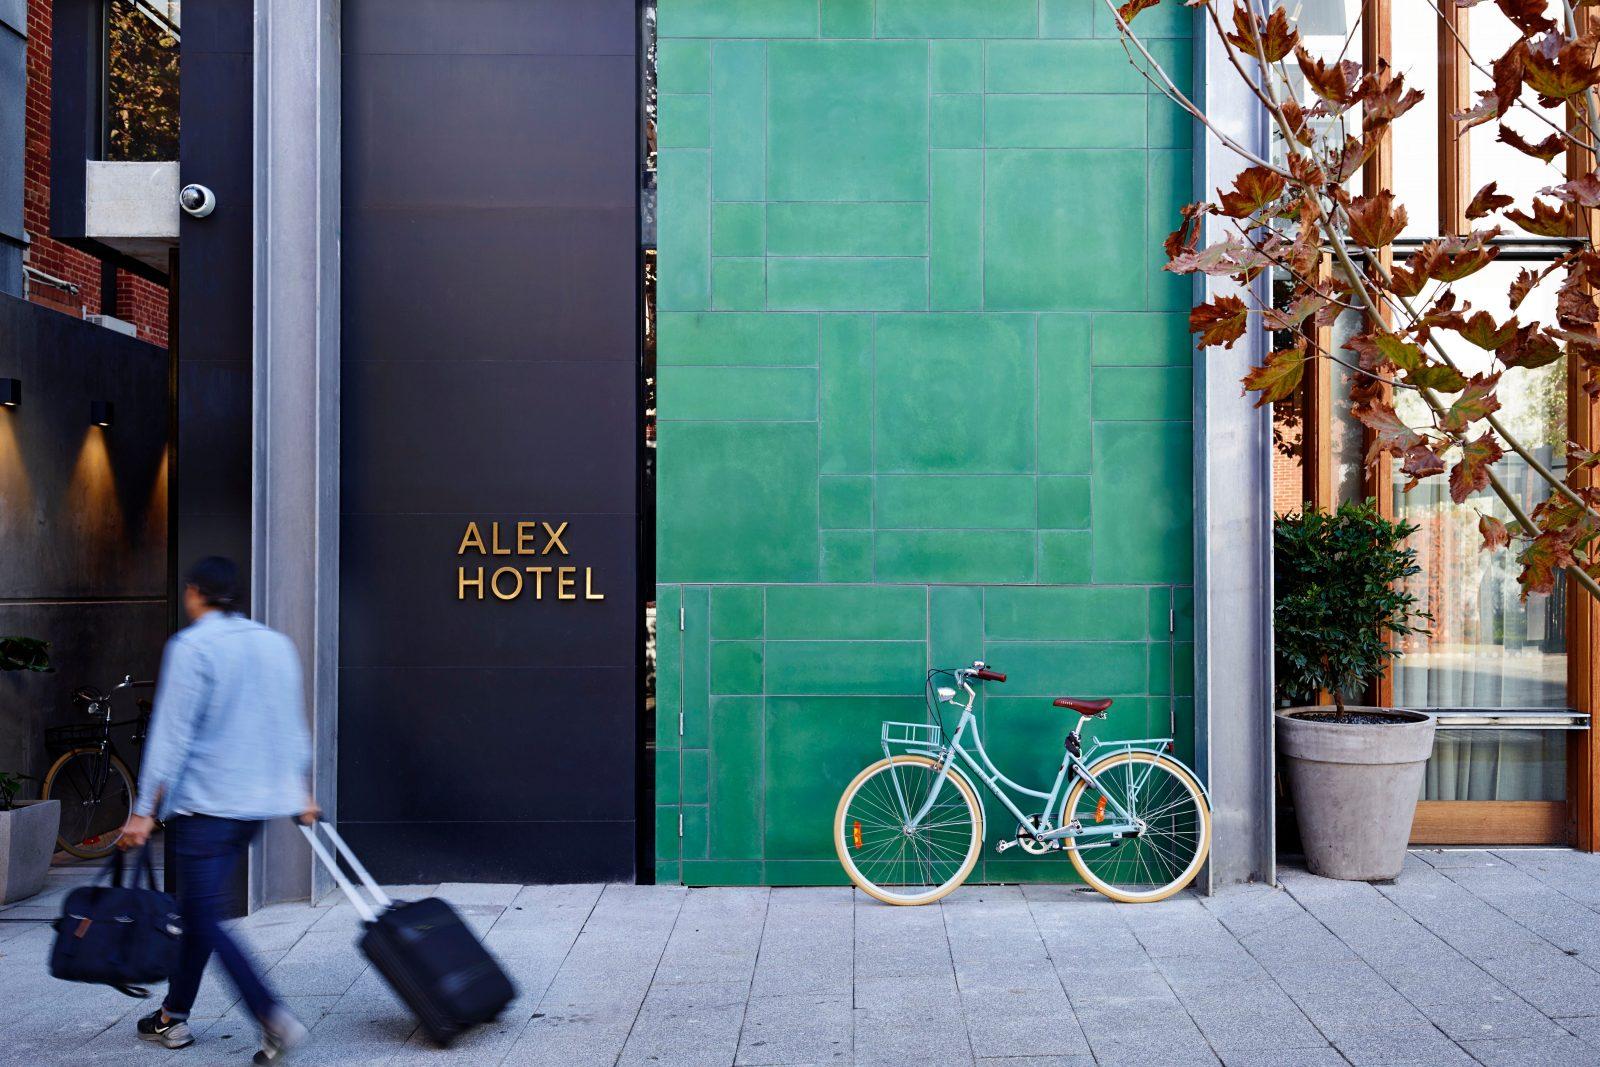 Alex Hotel, Perth, Western Australia